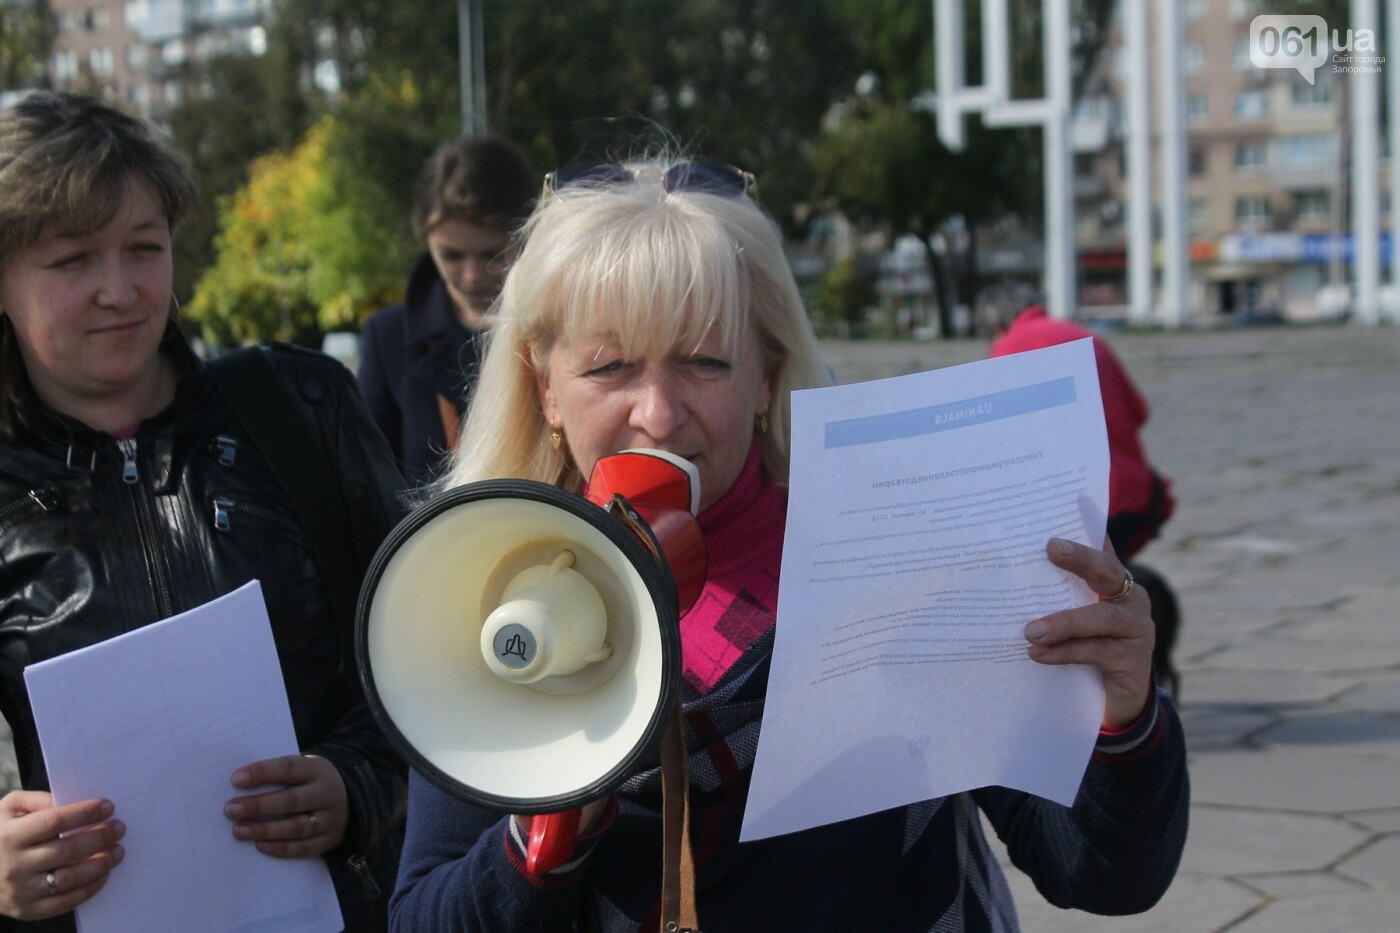 «Защити! Не мучай»: в Запорожье провели марш за права животных, – ФОТОРЕПОРТАЖ, ВИДЕО, фото-3